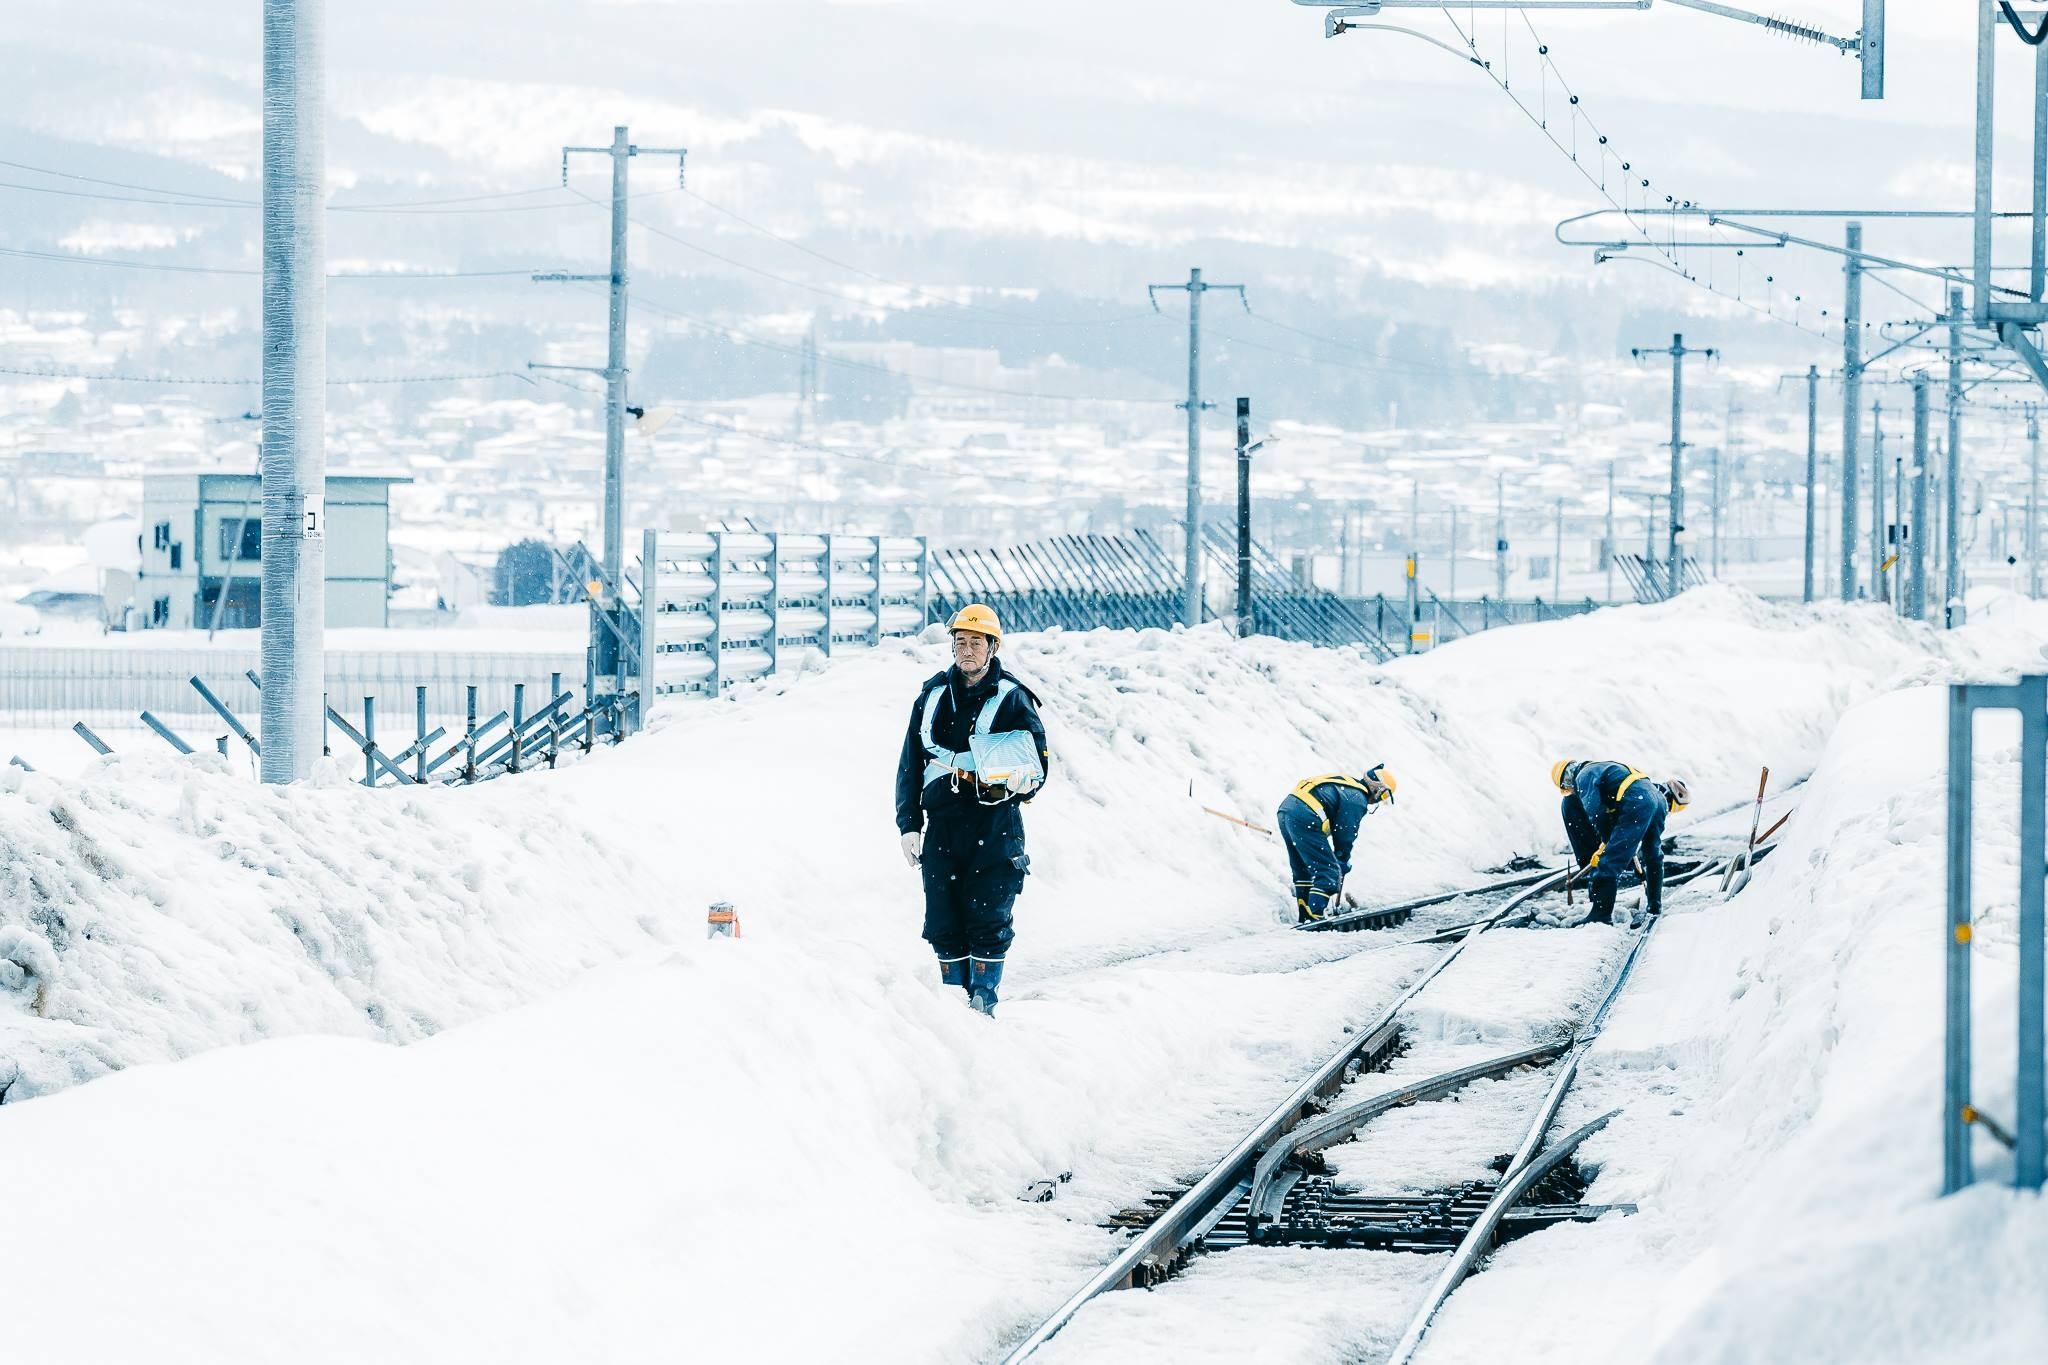 Hokkaido tuyet trang, noi dang den nhat mua dong o Nhat Ban hinh anh 34